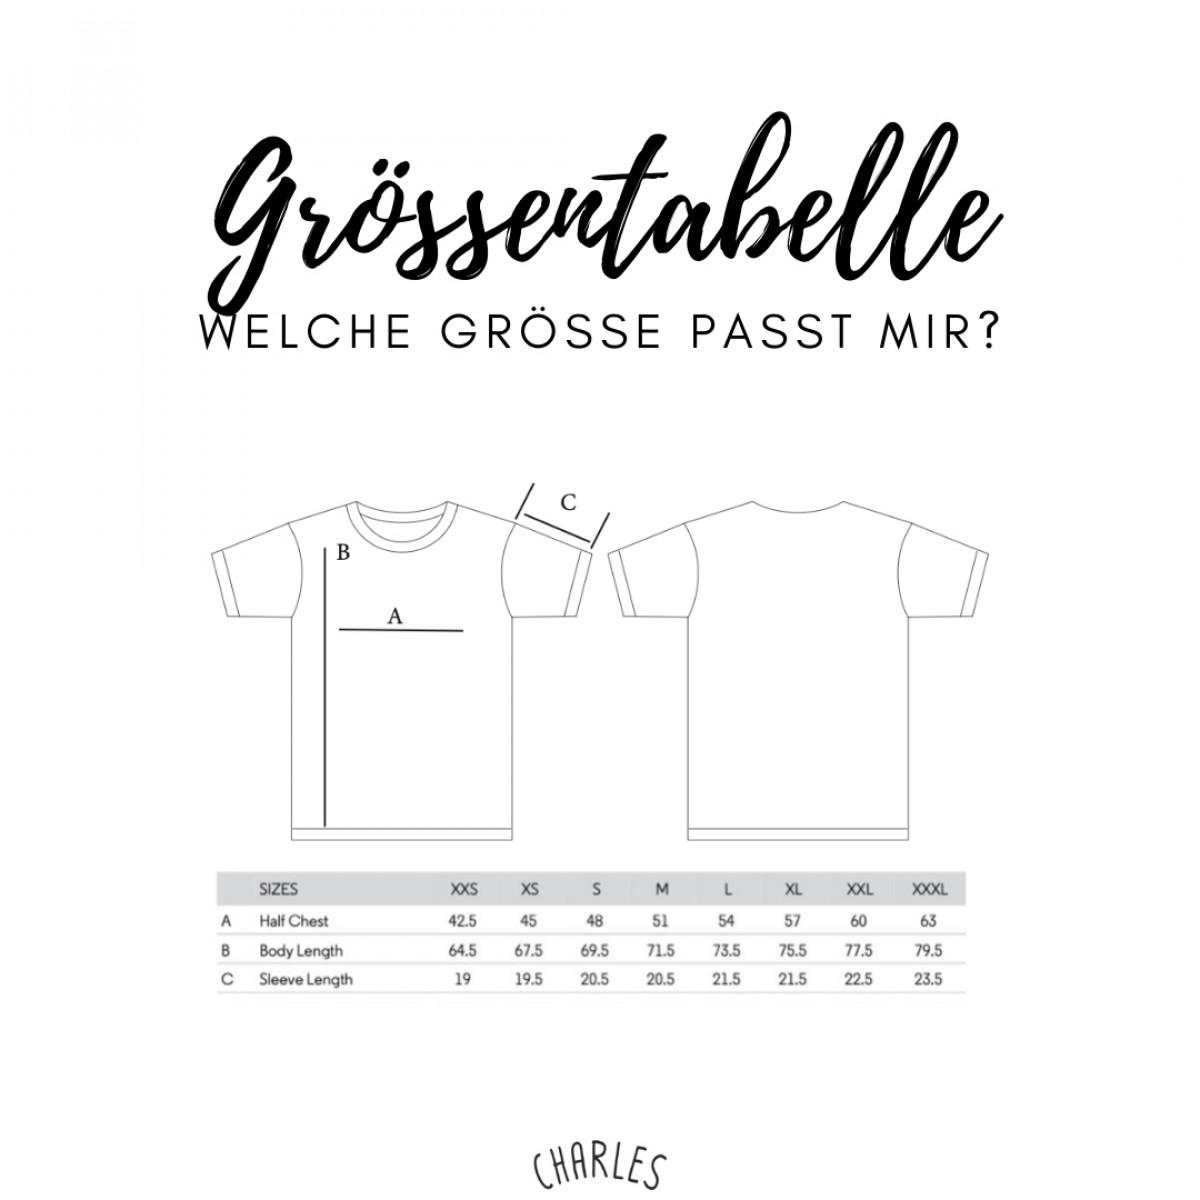 Charles / Shirt München II / 100% Biobaumwolle / Fair Wear zertifiziert